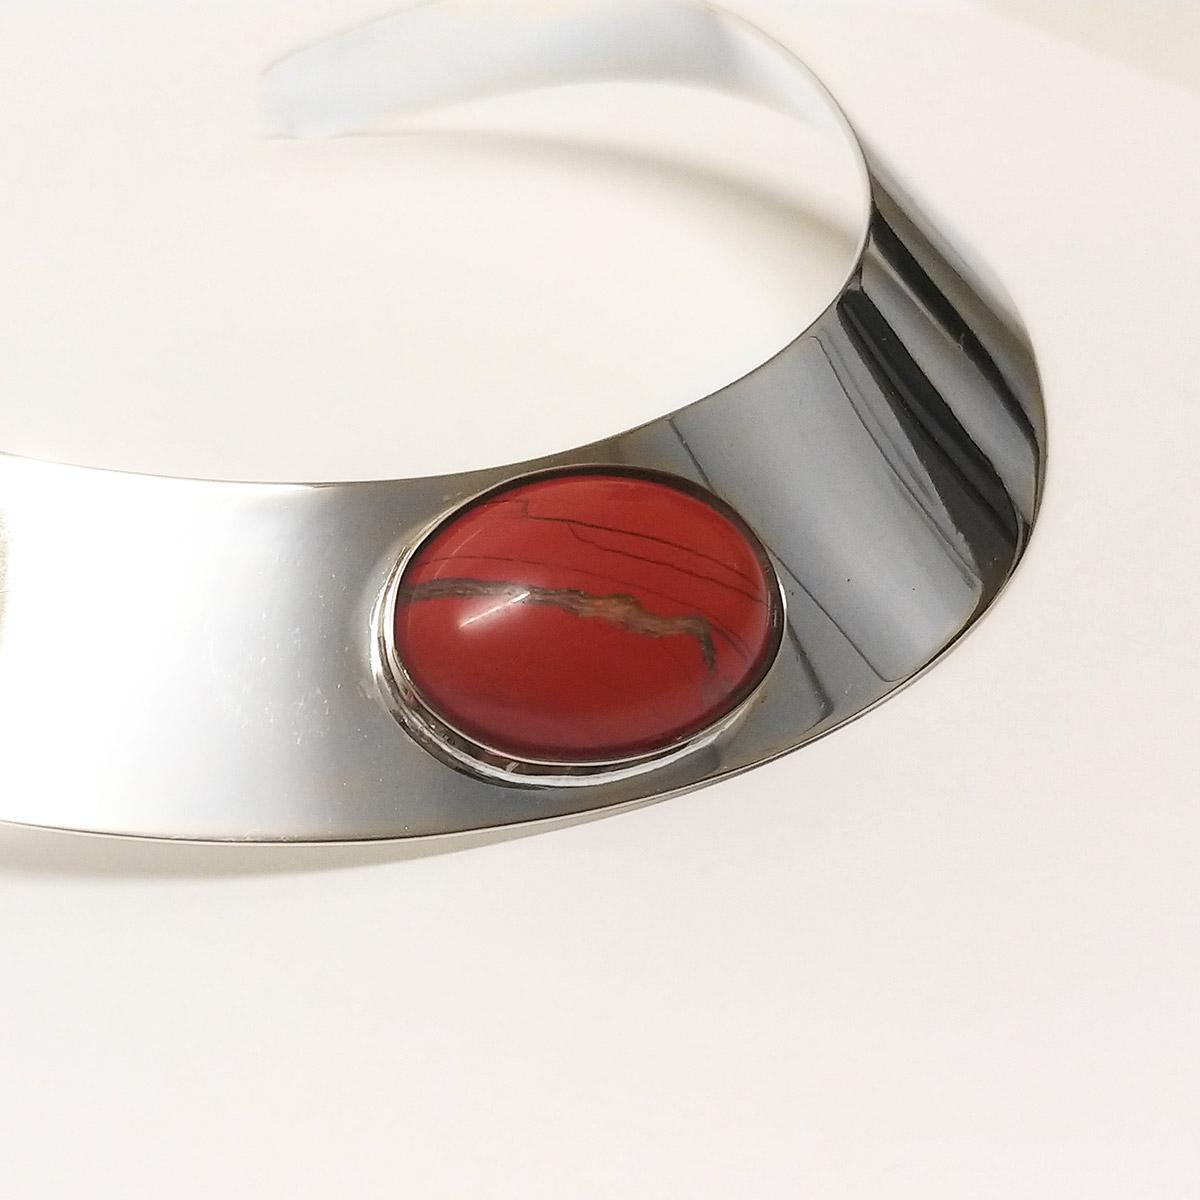 gargantilla plata artesanal | TANA tienda